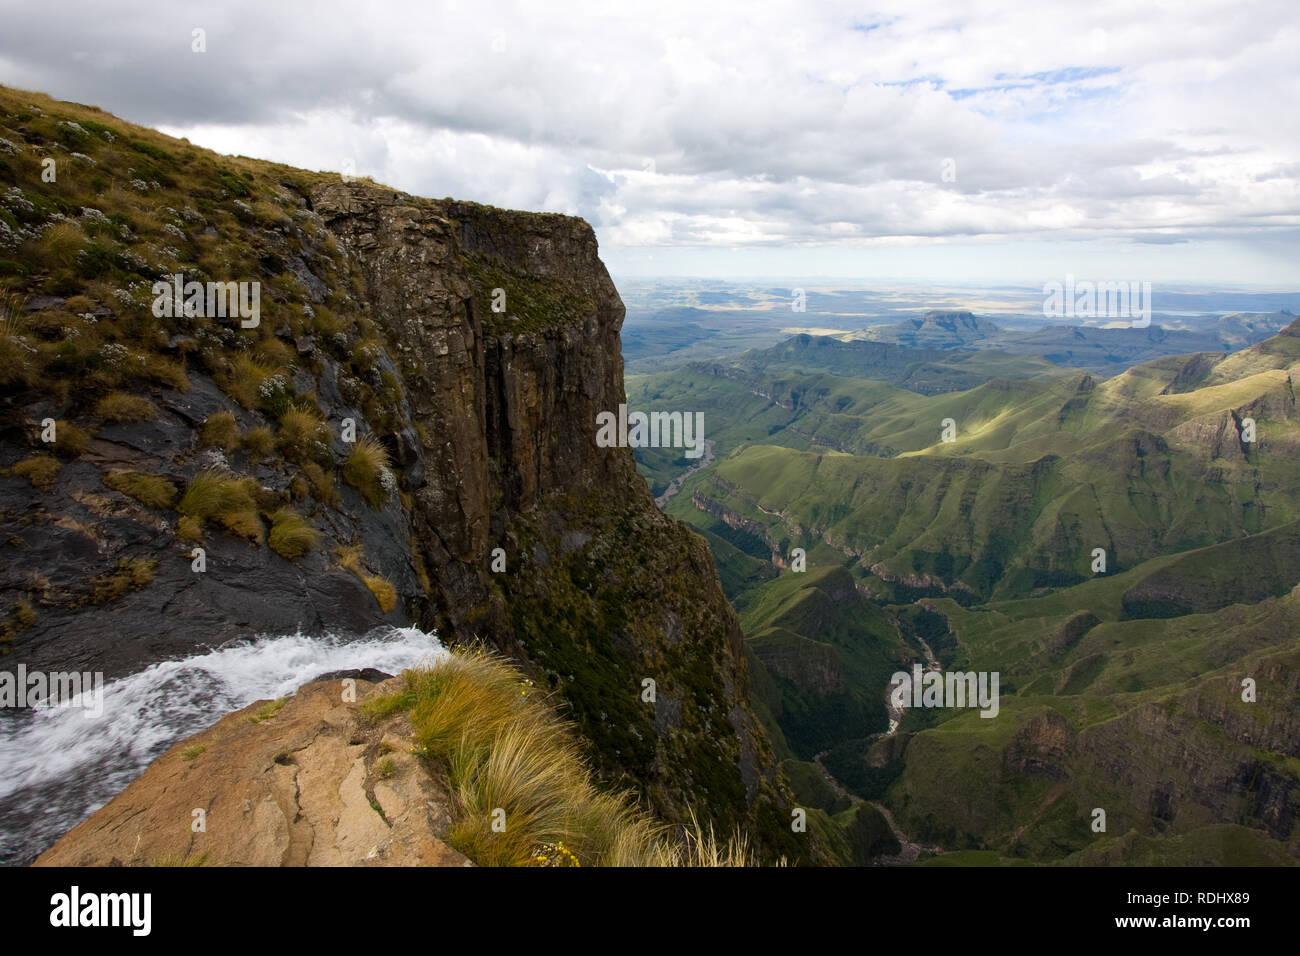 Tugela Wasserfall im Amphithetaer, Drakensberge, Royal Natal National Park, KwaZulu-Natal, Südafrika ist der zweithöchste Wasserfall der Erde Stockfoto